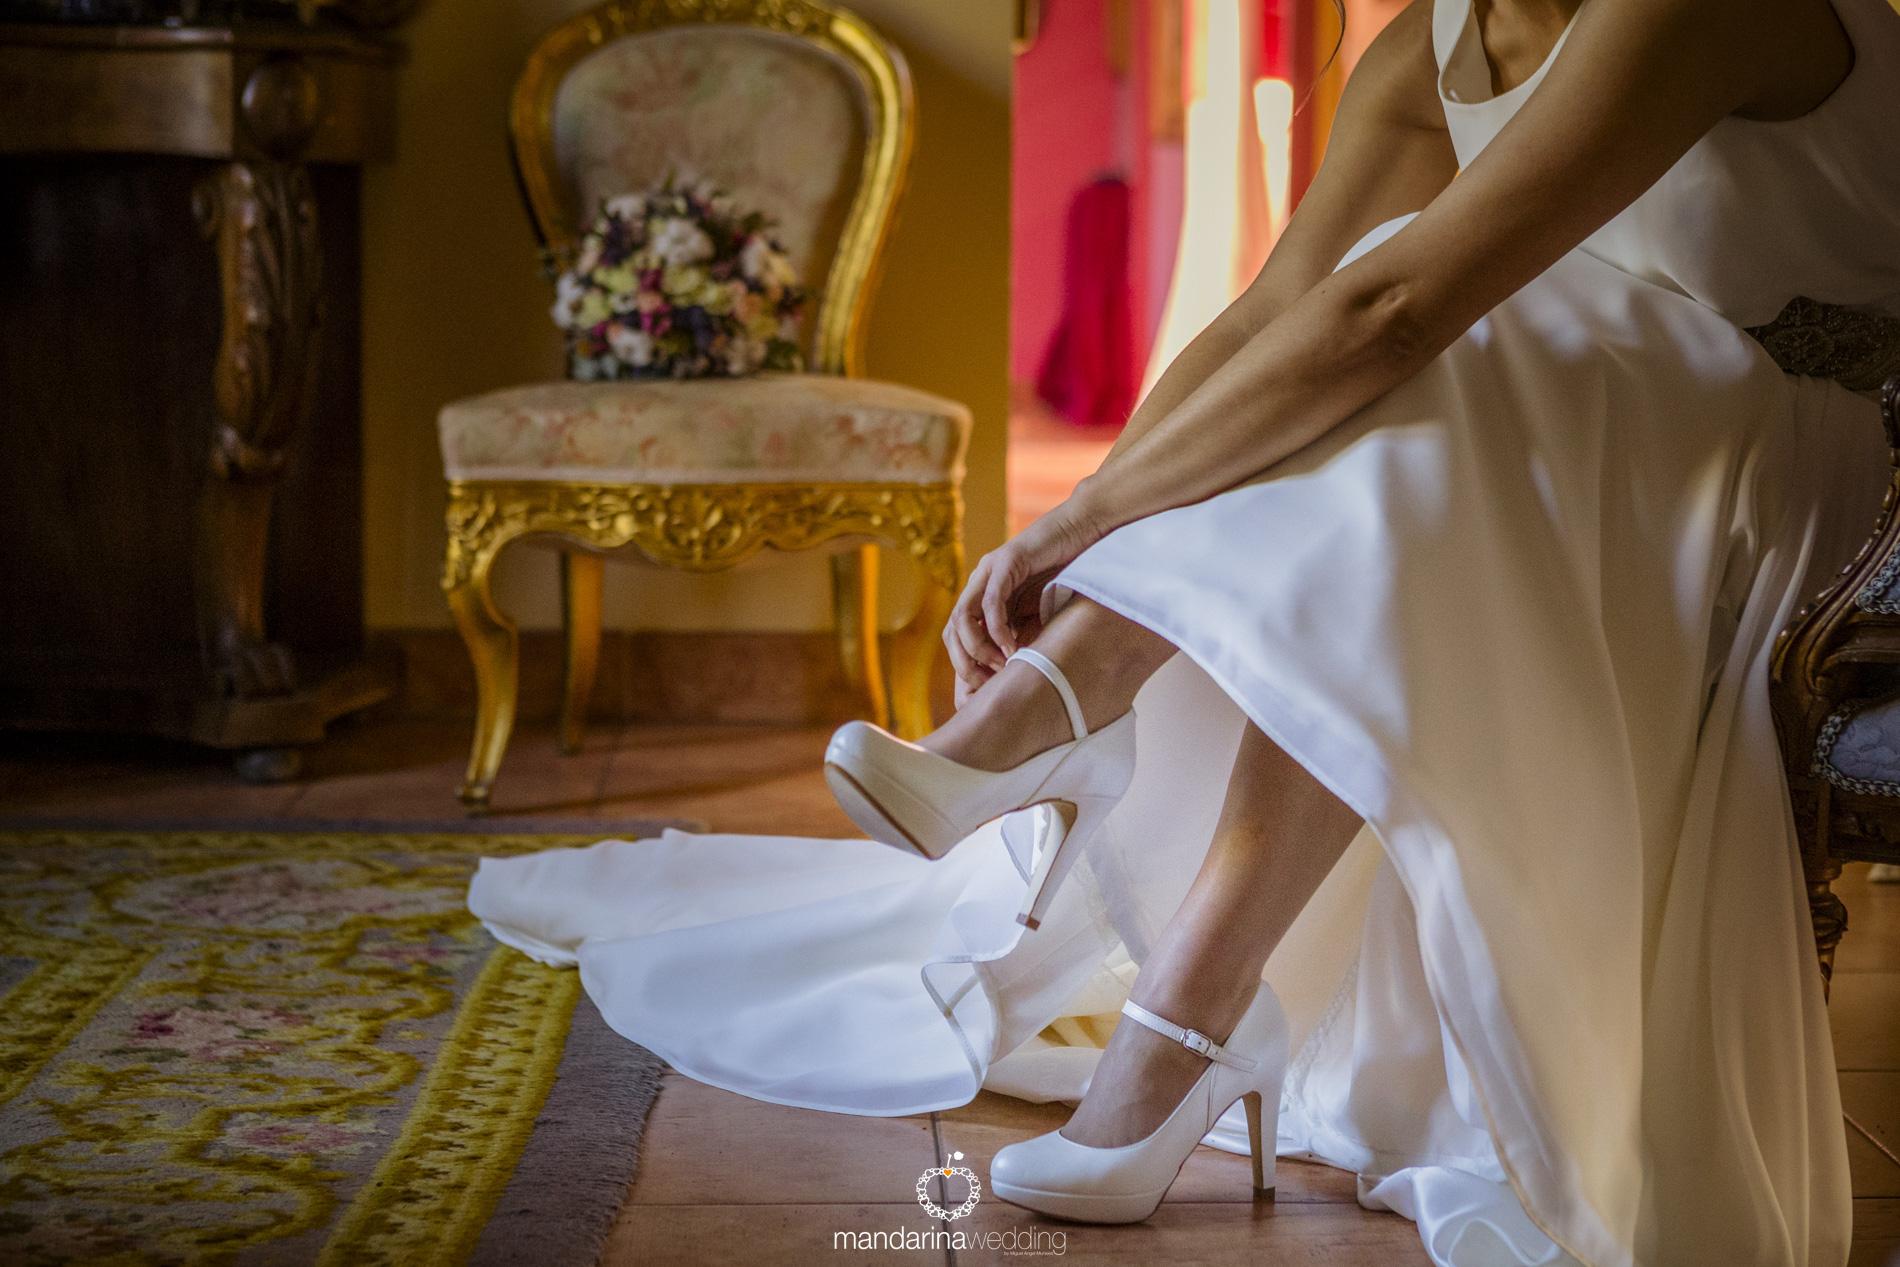 mandarina wedding, fotografos de boda, fotografo boda soria, fotografo boda barcelona, fotografo boda Madrid, fotógrafo boda lerida_26